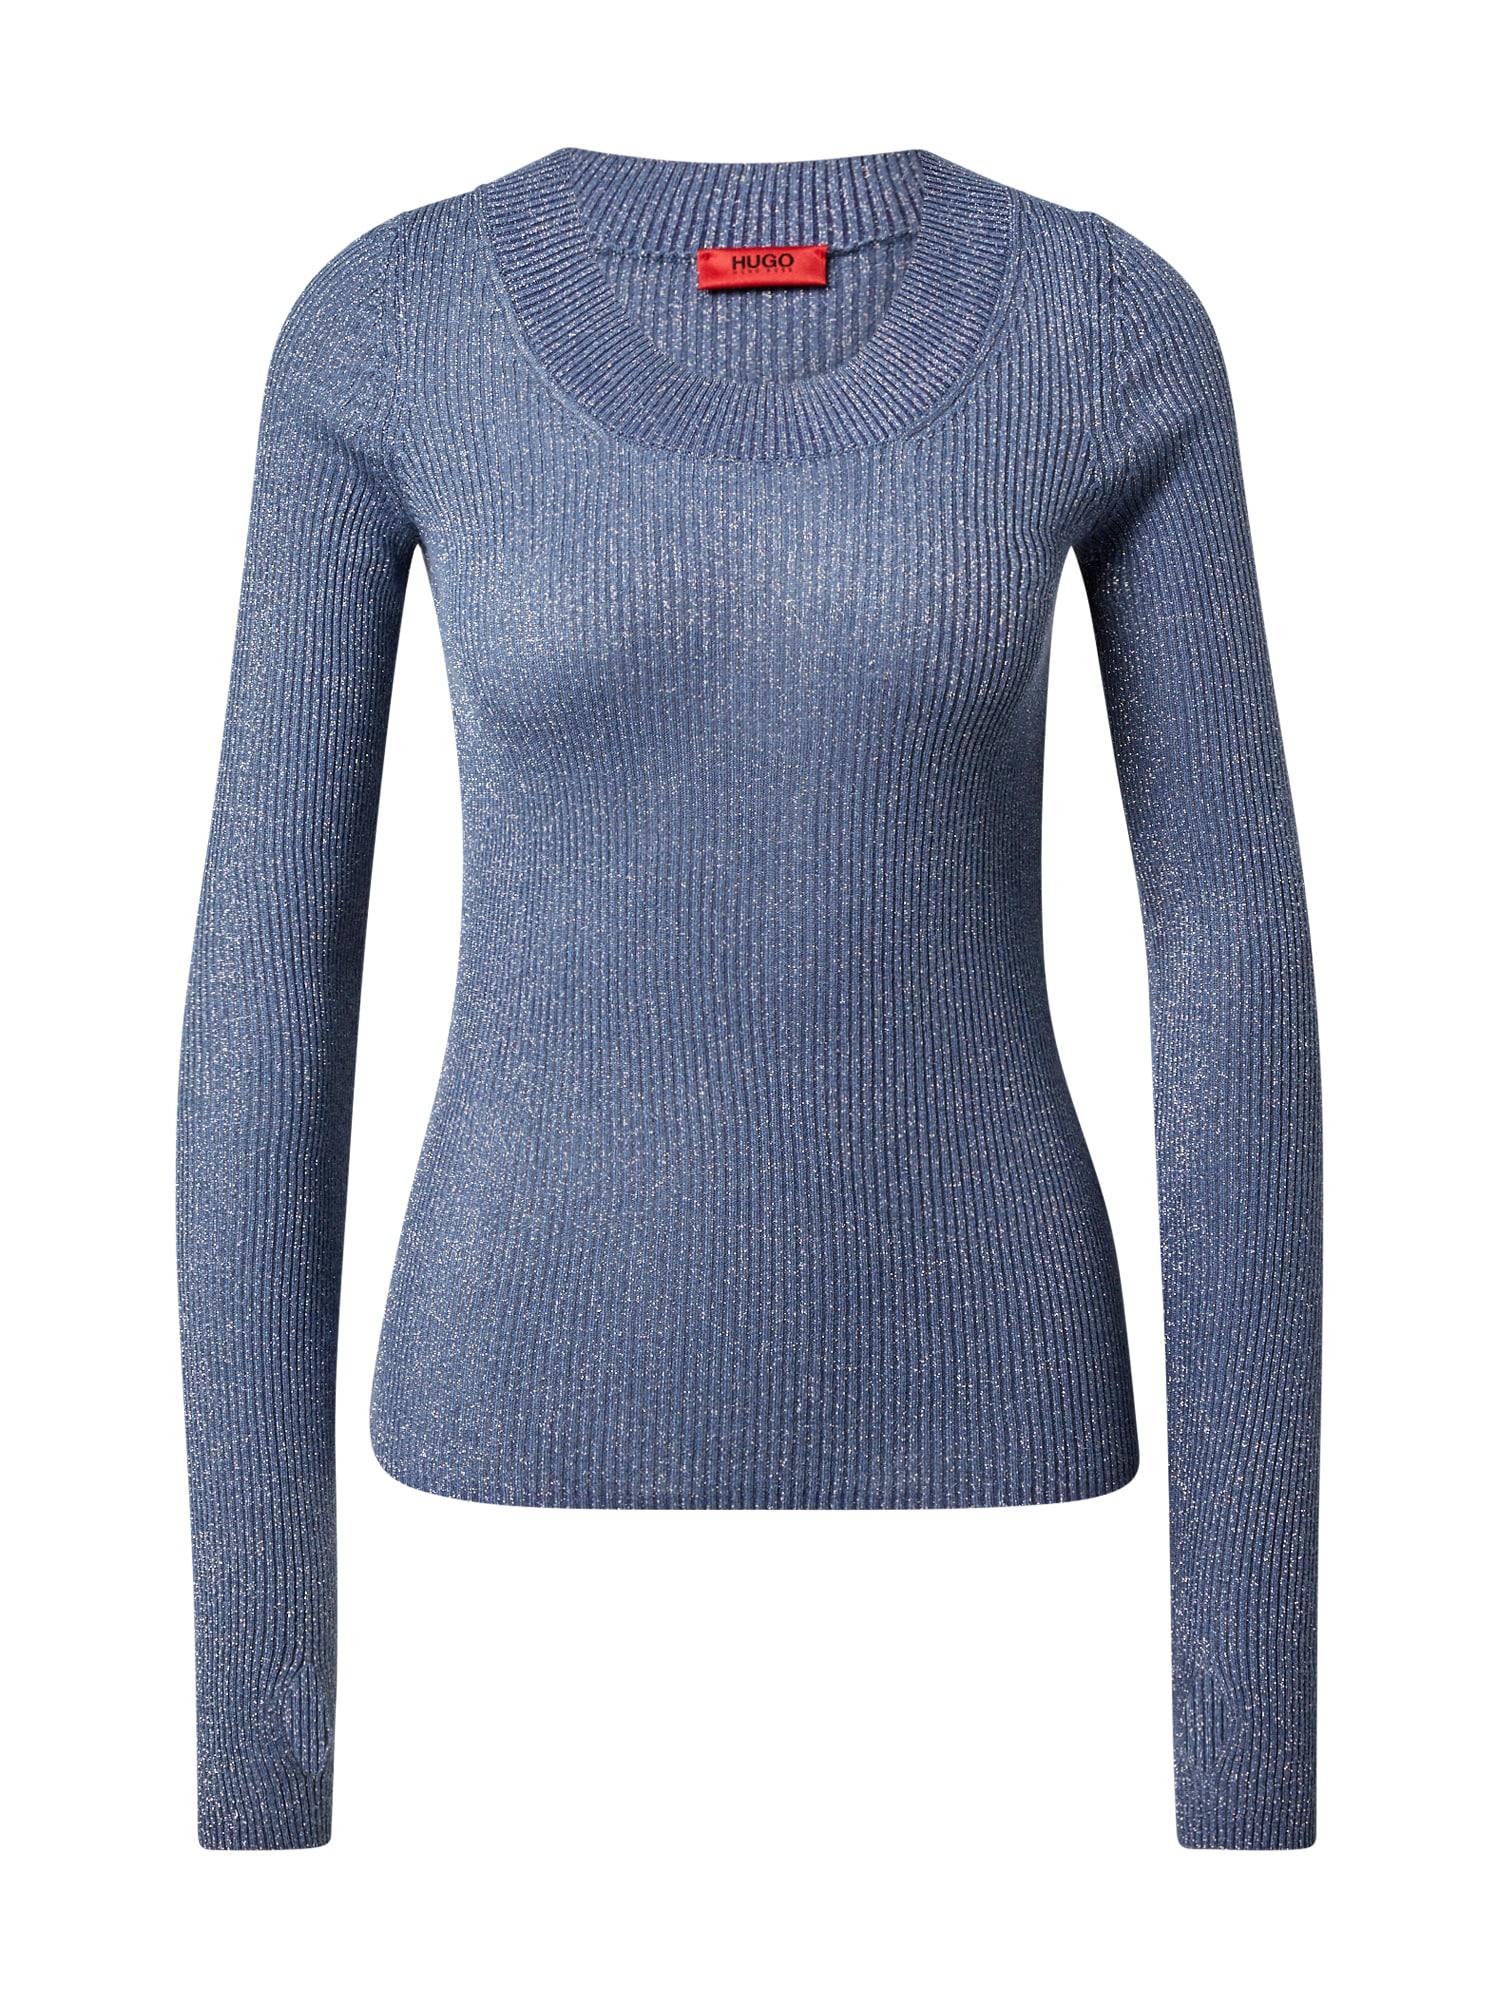 HUGO Megztinis 'Sunessa' mėlyna